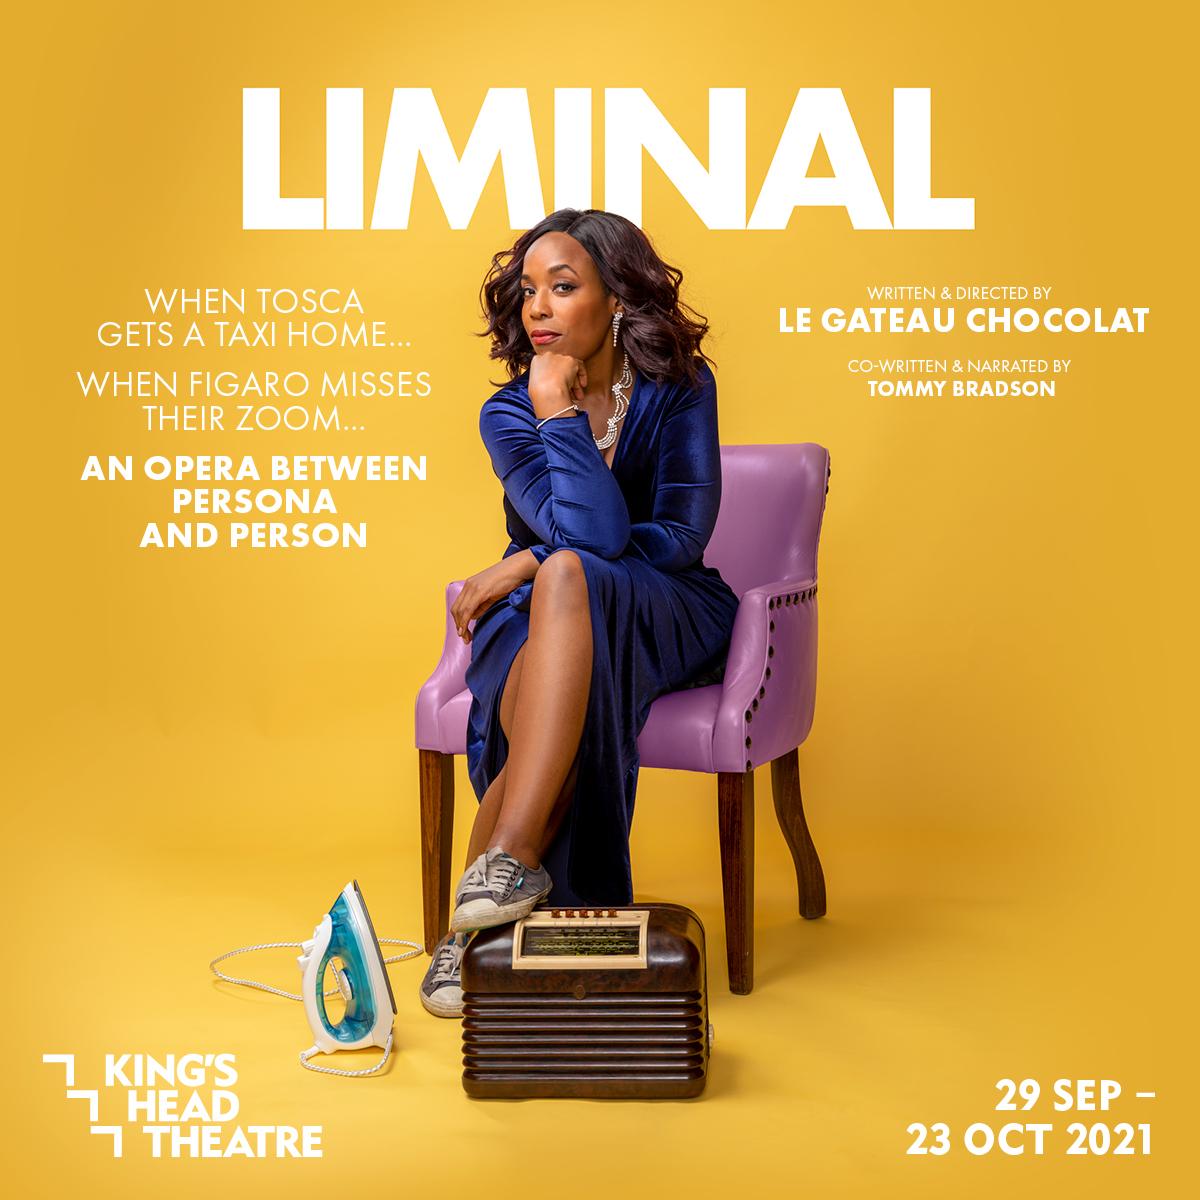 Autumn Opera Liminal Officially Announced